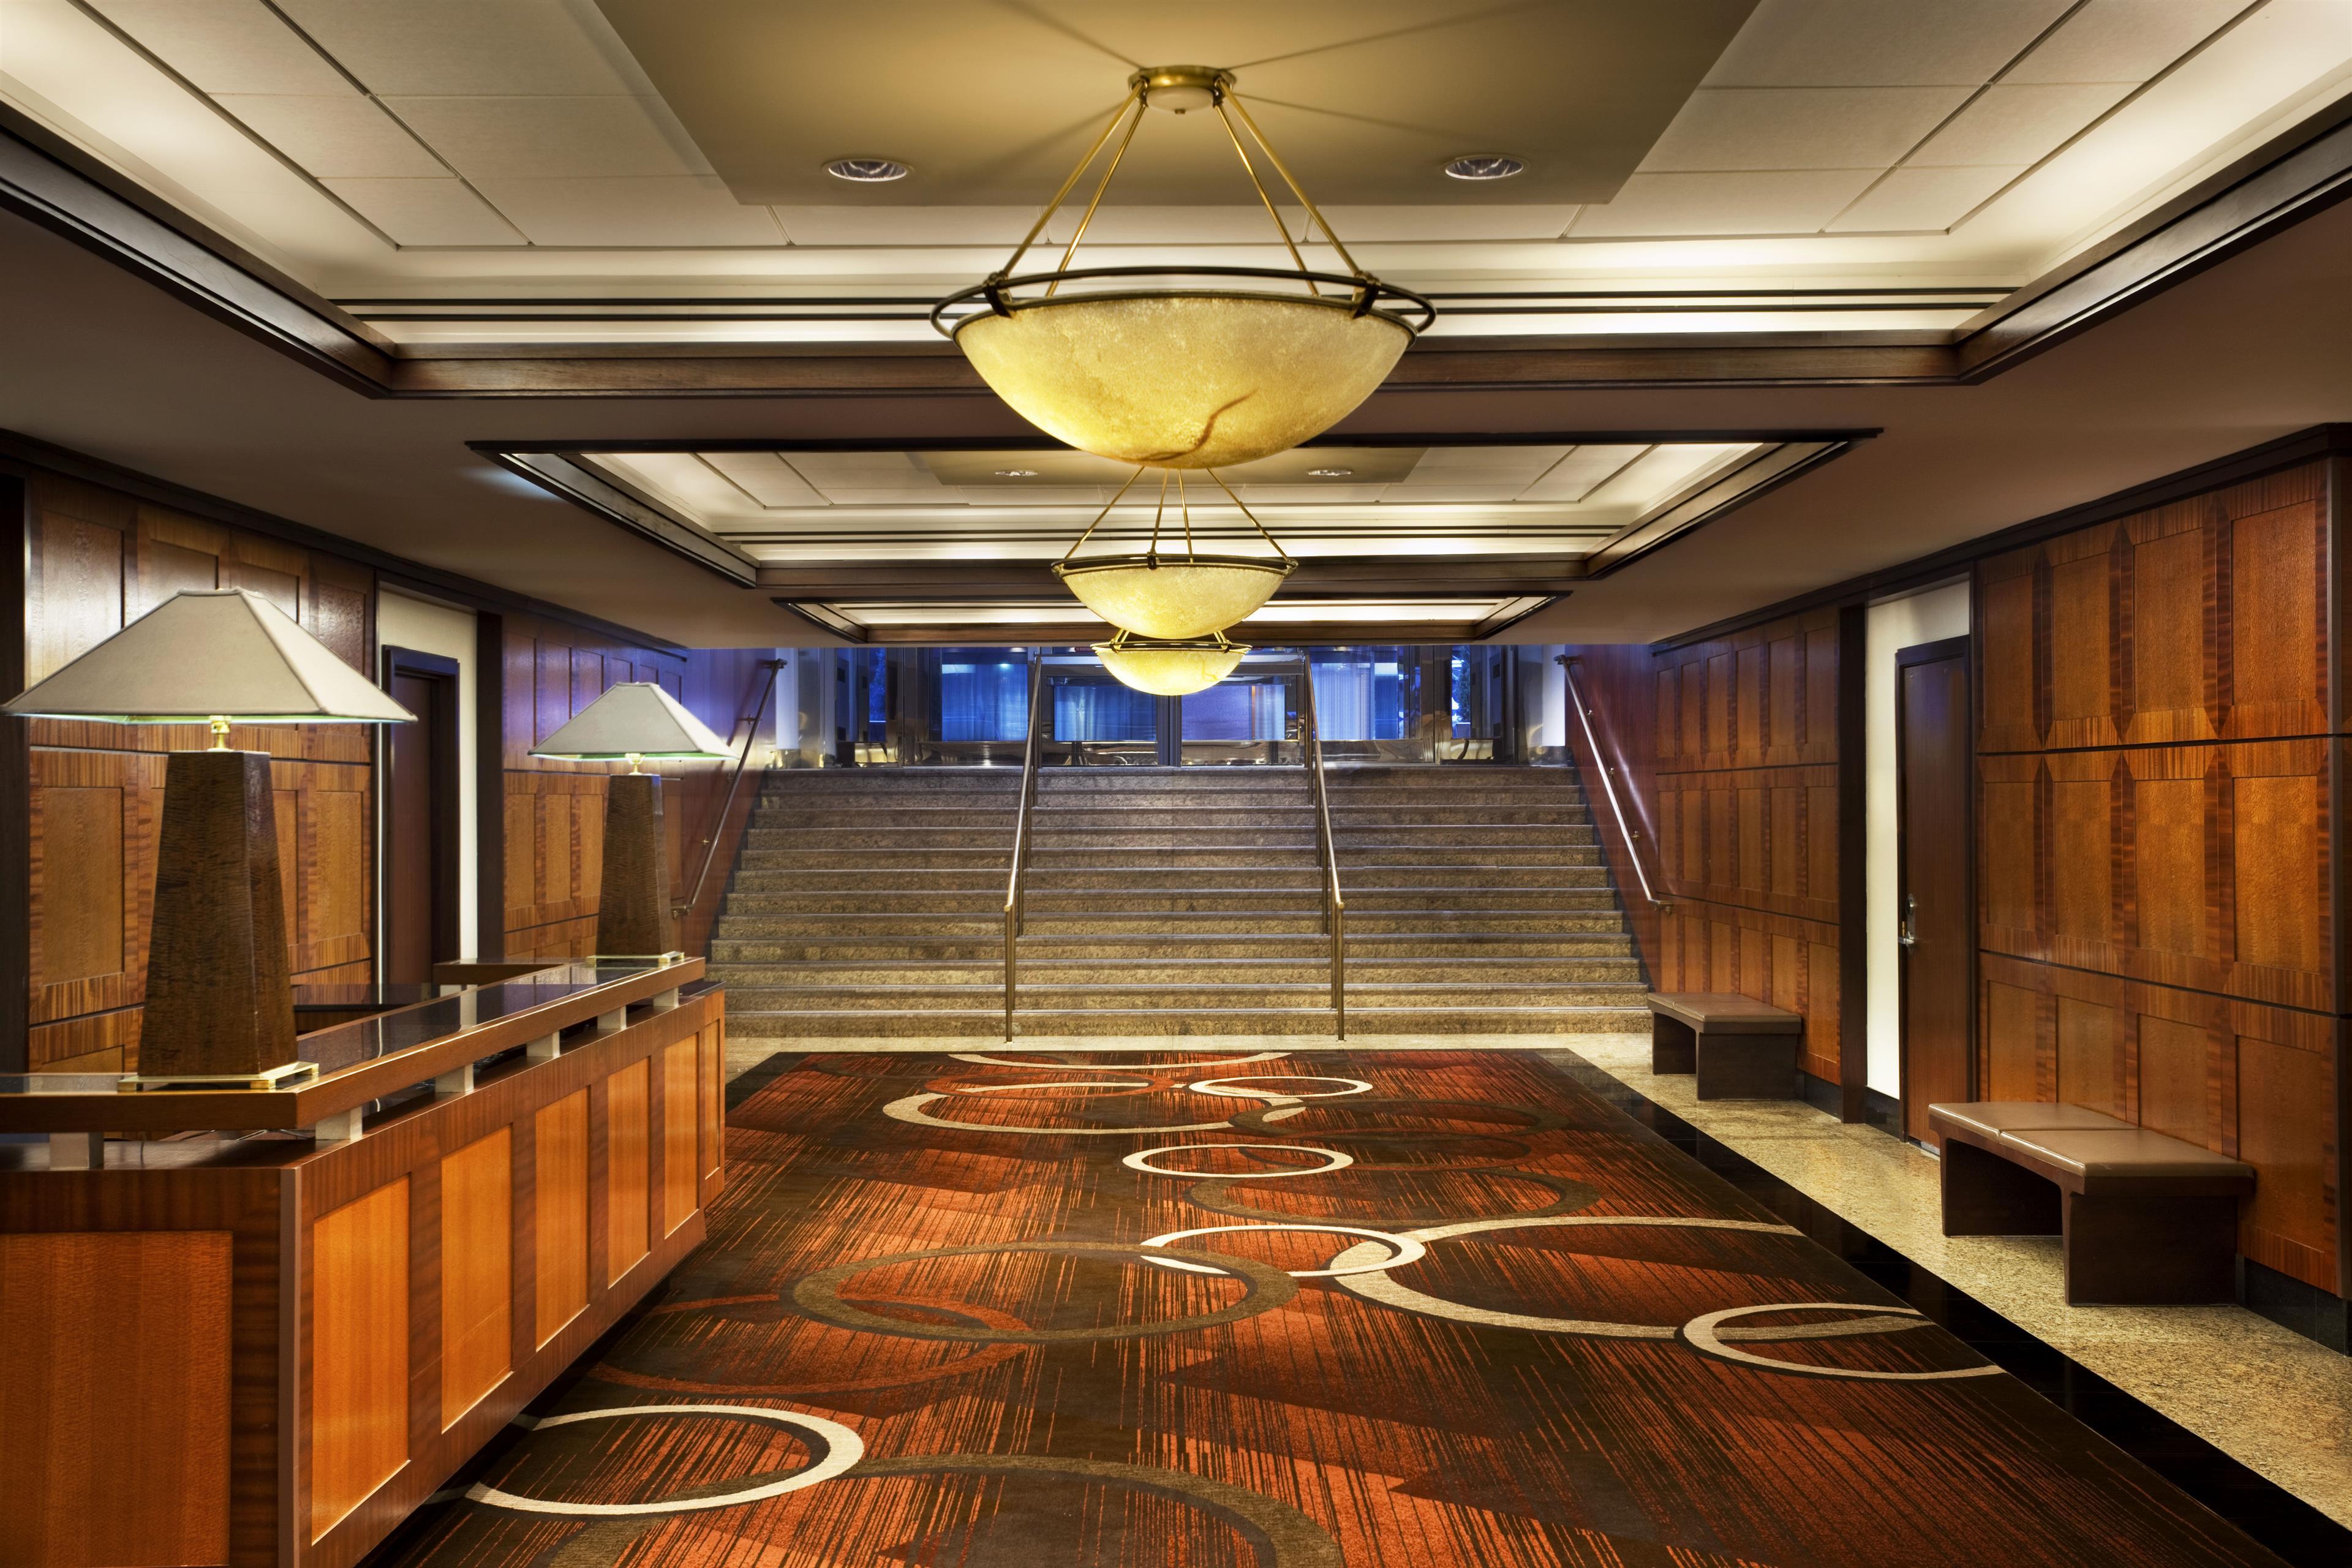 Sheraton New York Times Square Hotel image 33